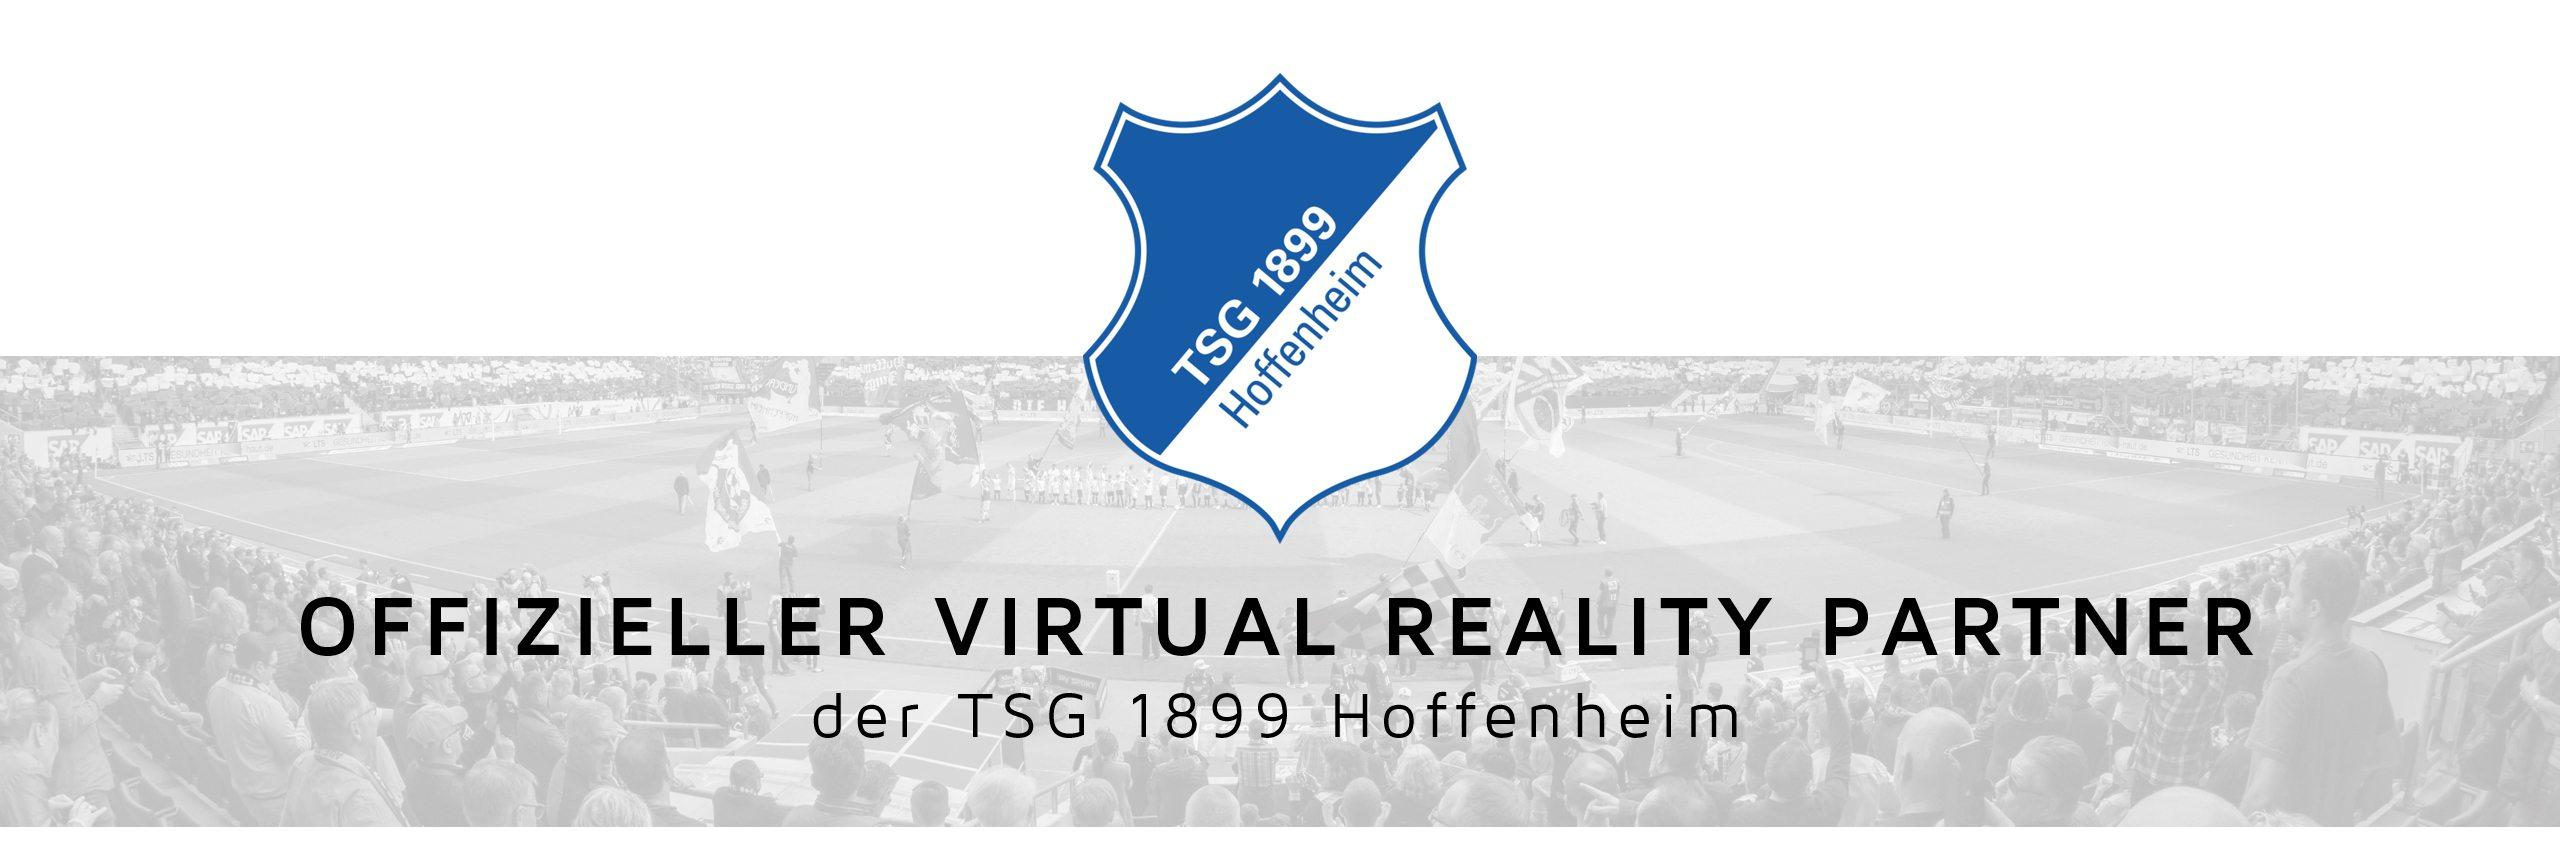 RELEASE ist Virtual Reality Partner der TSG Hoffenheim